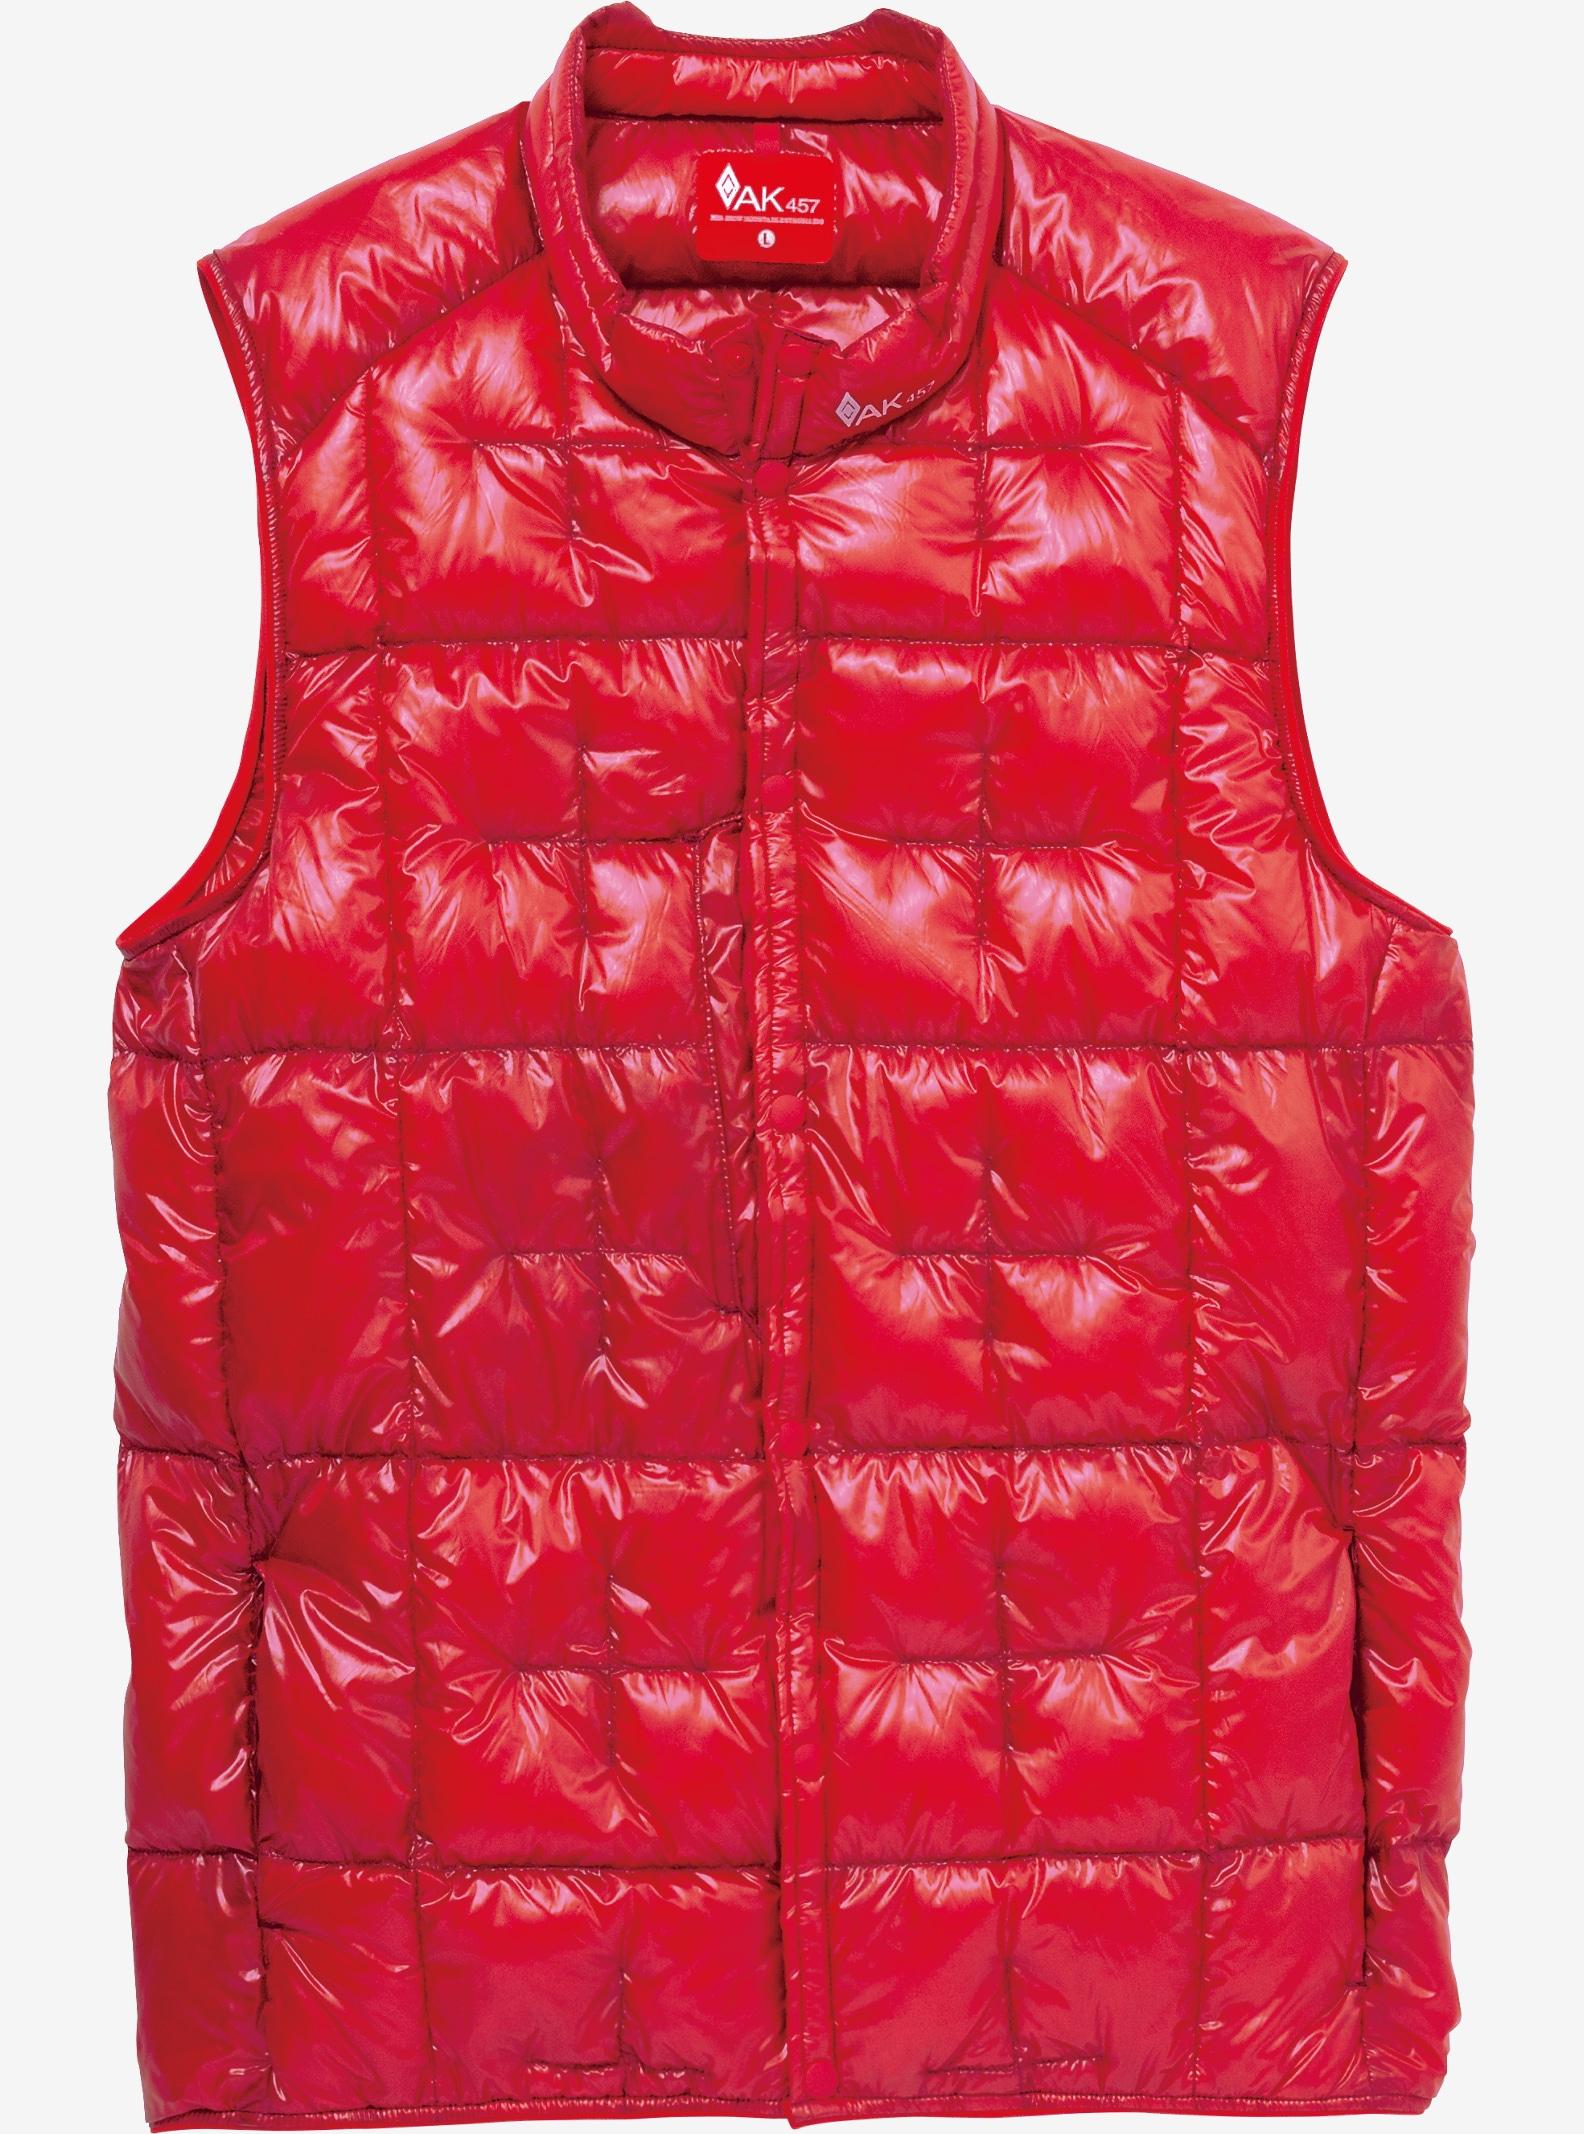 Burton AK457 Packable Down Vest Insulator shown in Red